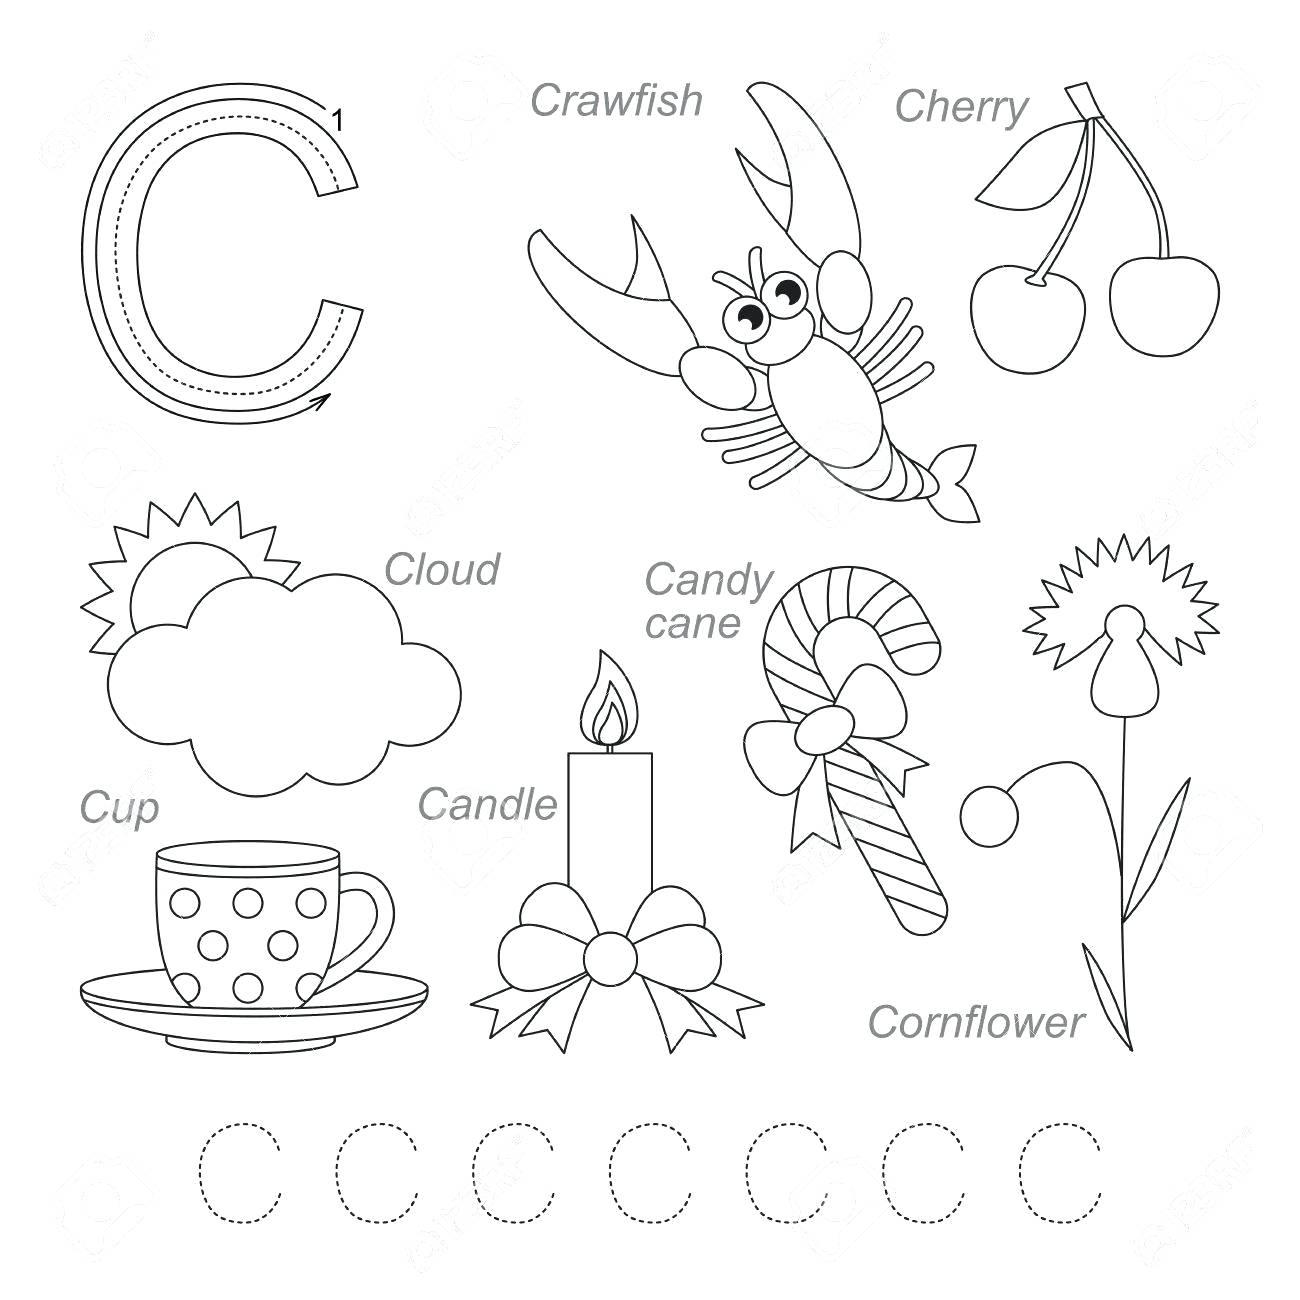 Letter C Worksheets To Printable. Letter C Worksheets - Misc pertaining to Letter C Worksheets Free Printable